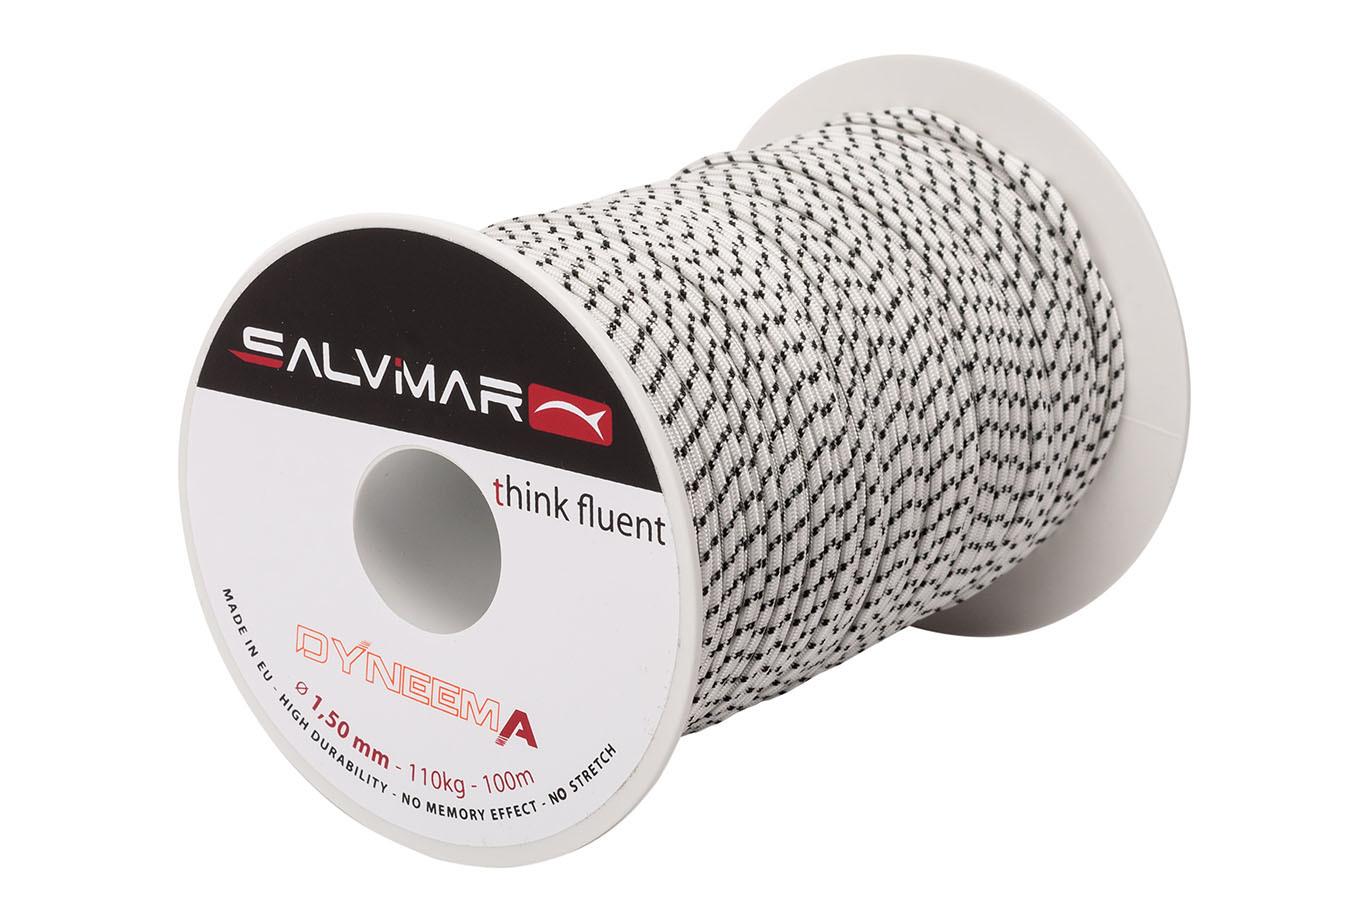 Линь Salvimar Dyneema, ø 1.5 мм., белый, до 110 кг.